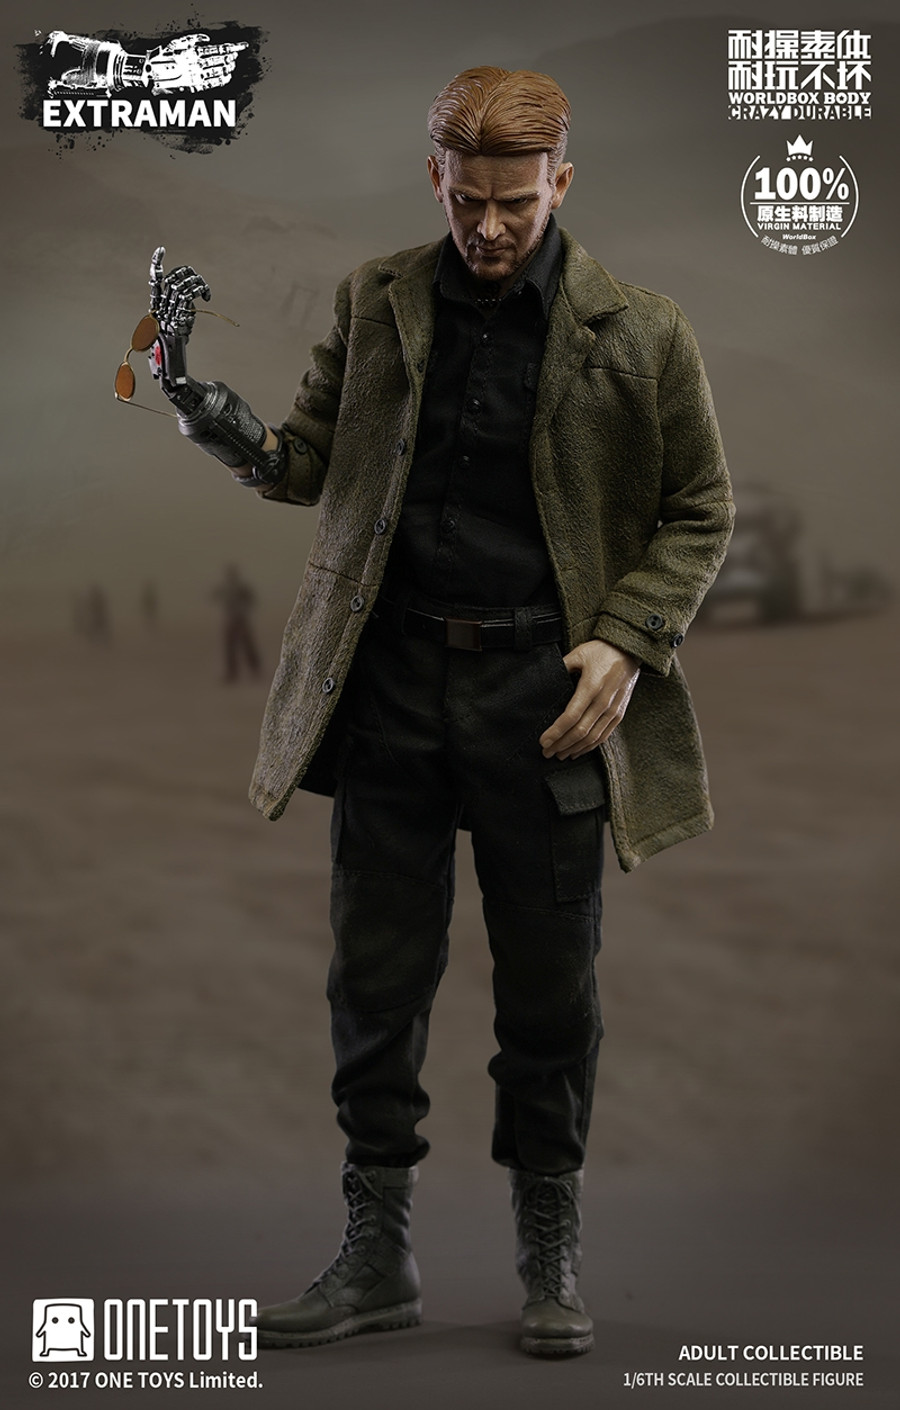 One Toys x Worldbox - Hound Dog Man